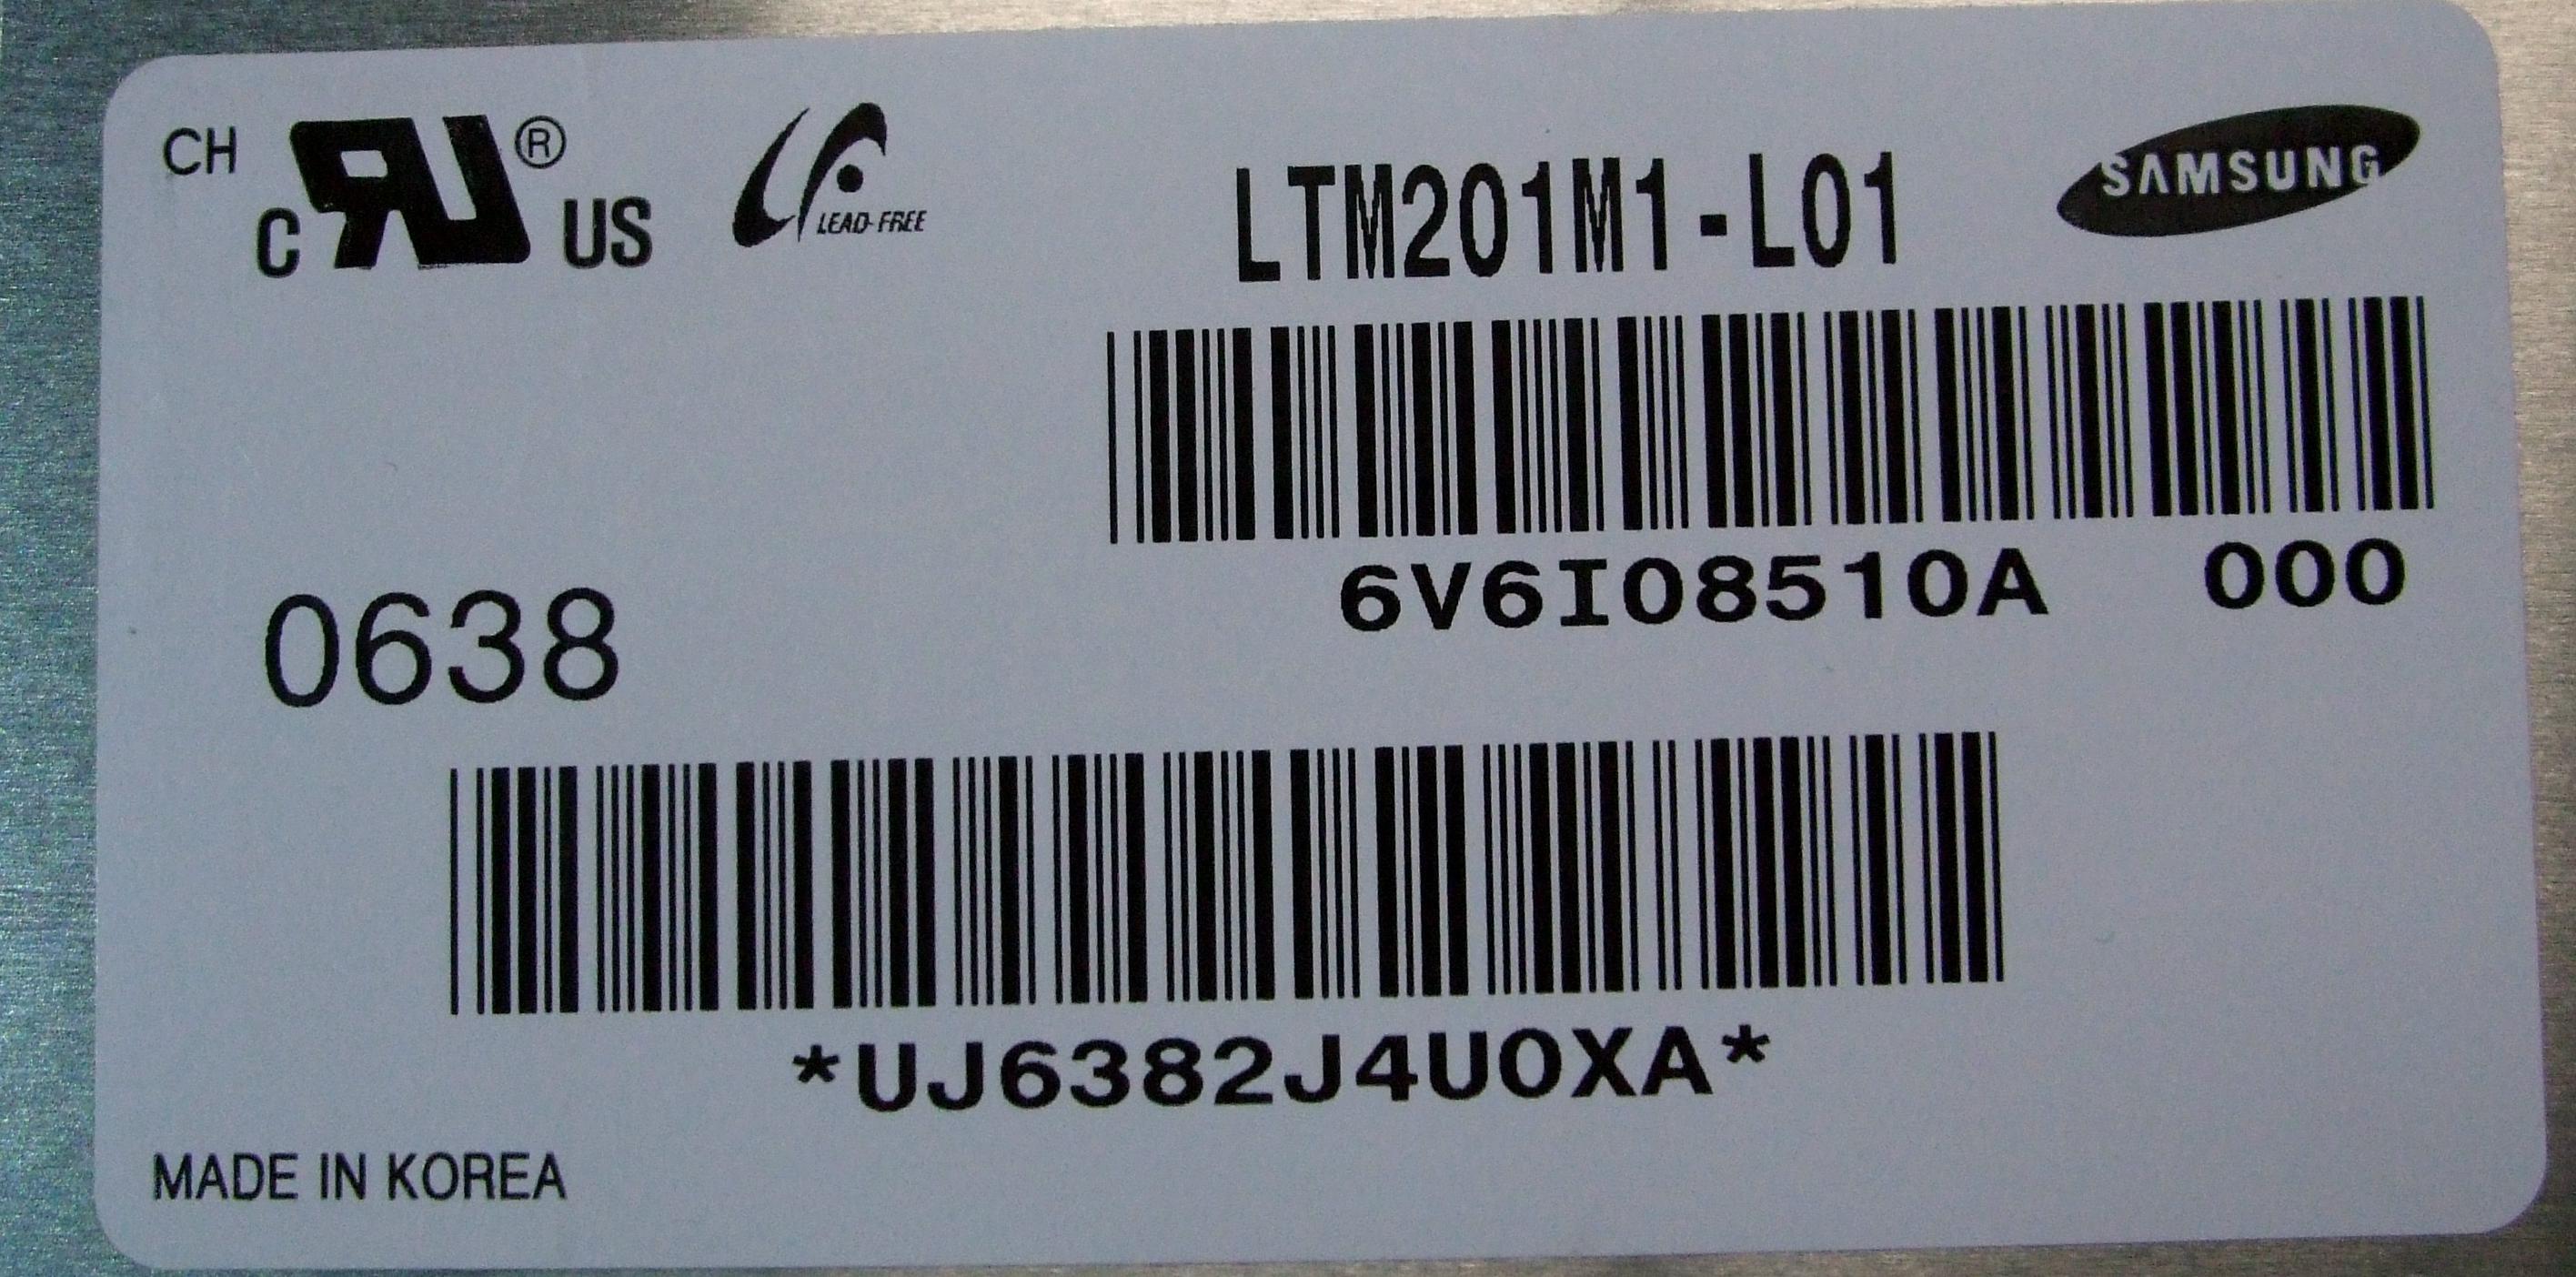 "Apple 20.1"" Screen /f 20"" iMac A1174 EMC 2105 (Late 2006) - Samsung LTM201M1-L01"